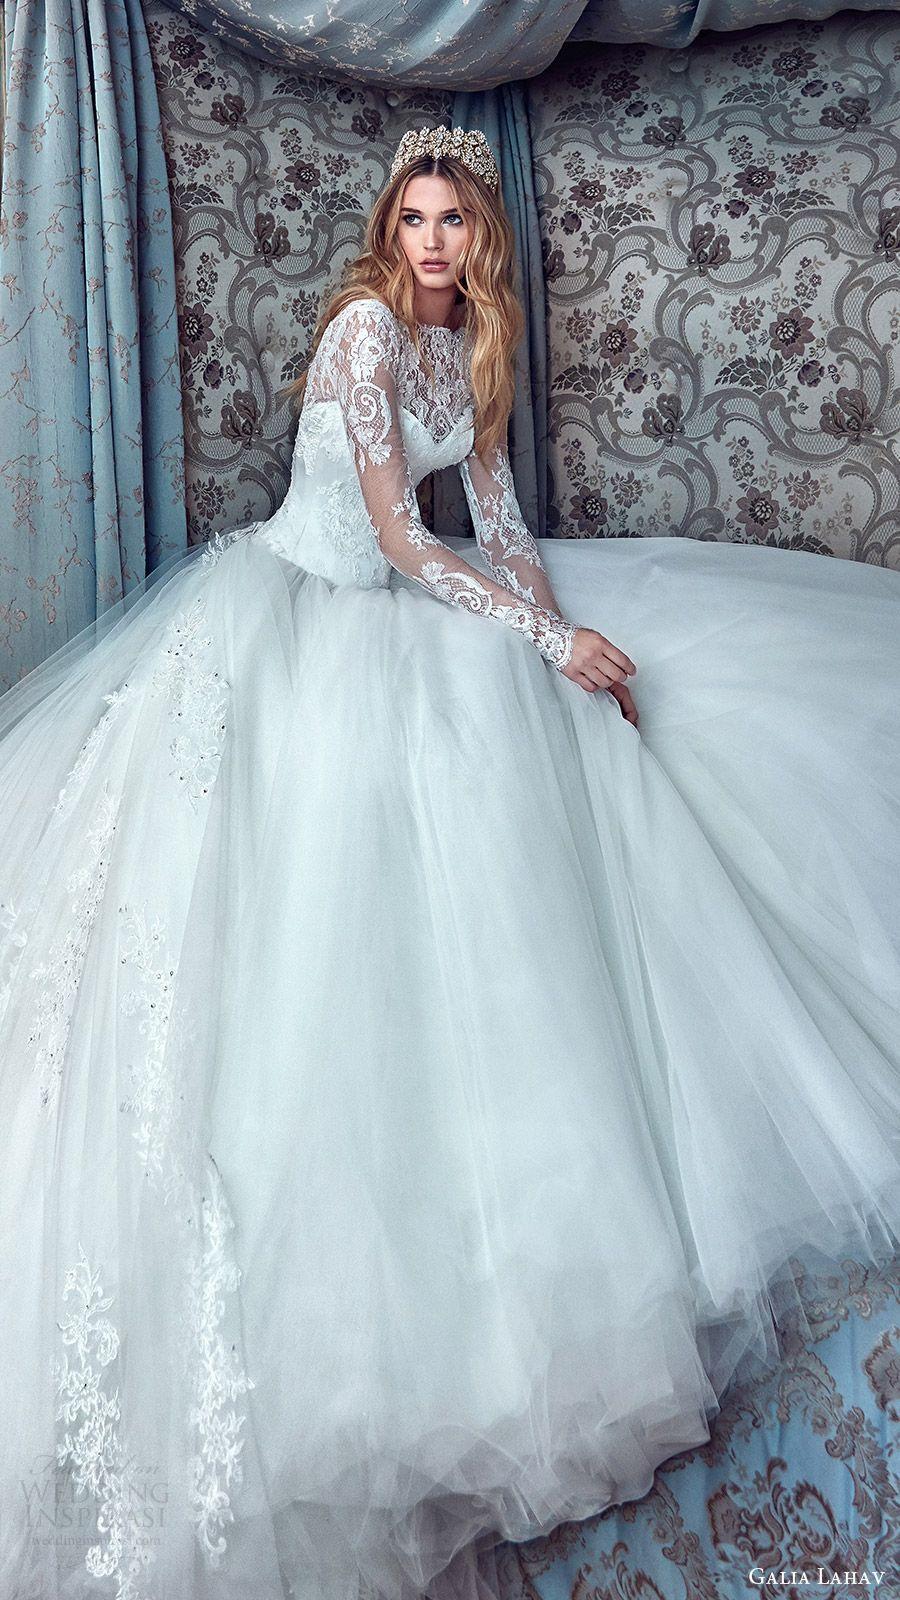 Galia lahav bridal spring long sleeves high neck ball gown